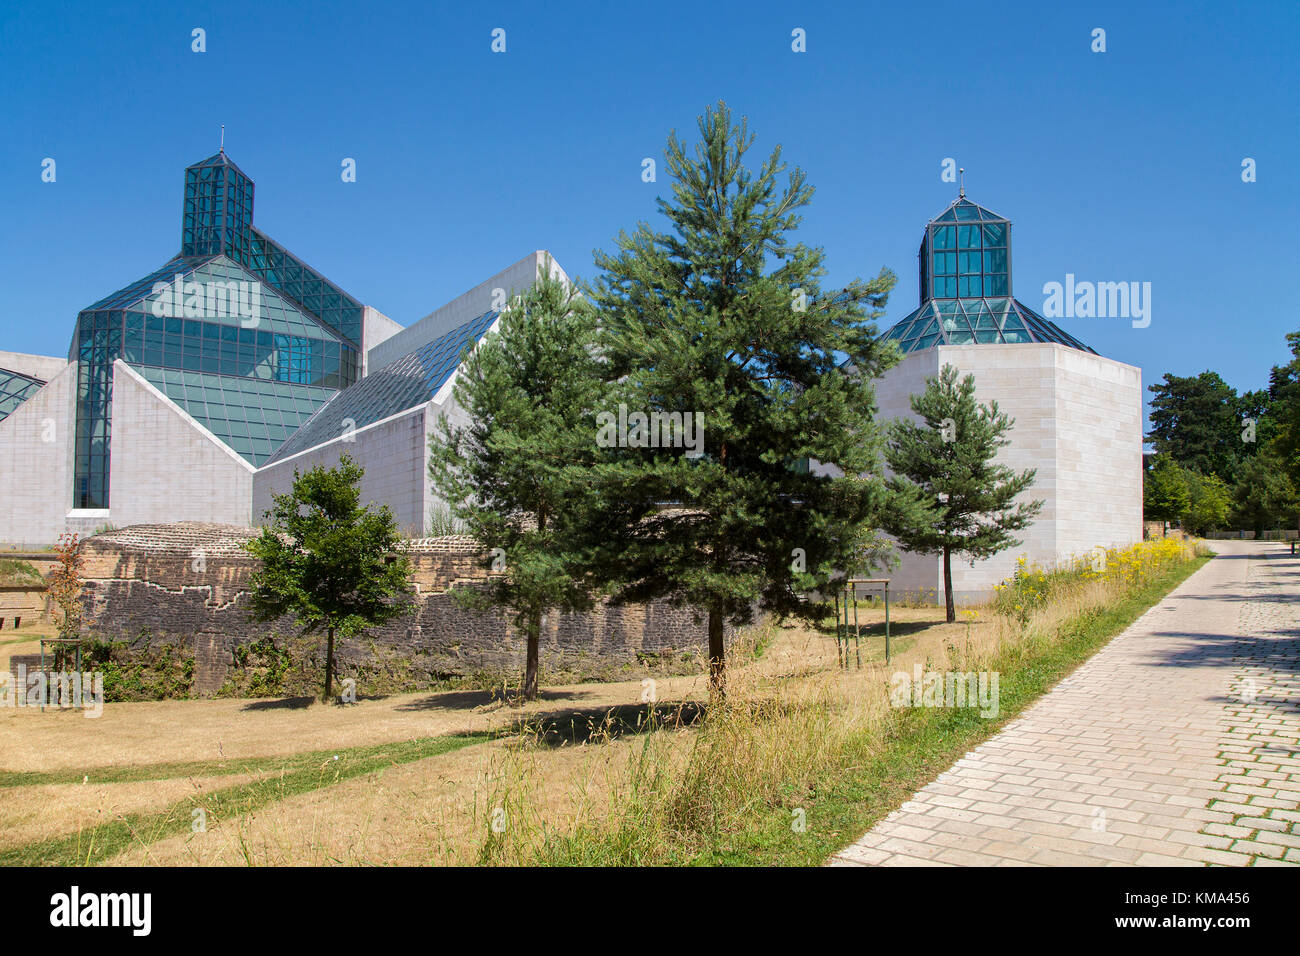 Museum of modern art, Kirchberg, Luxembourg-city, Luxembourg, Europe Stock Photo